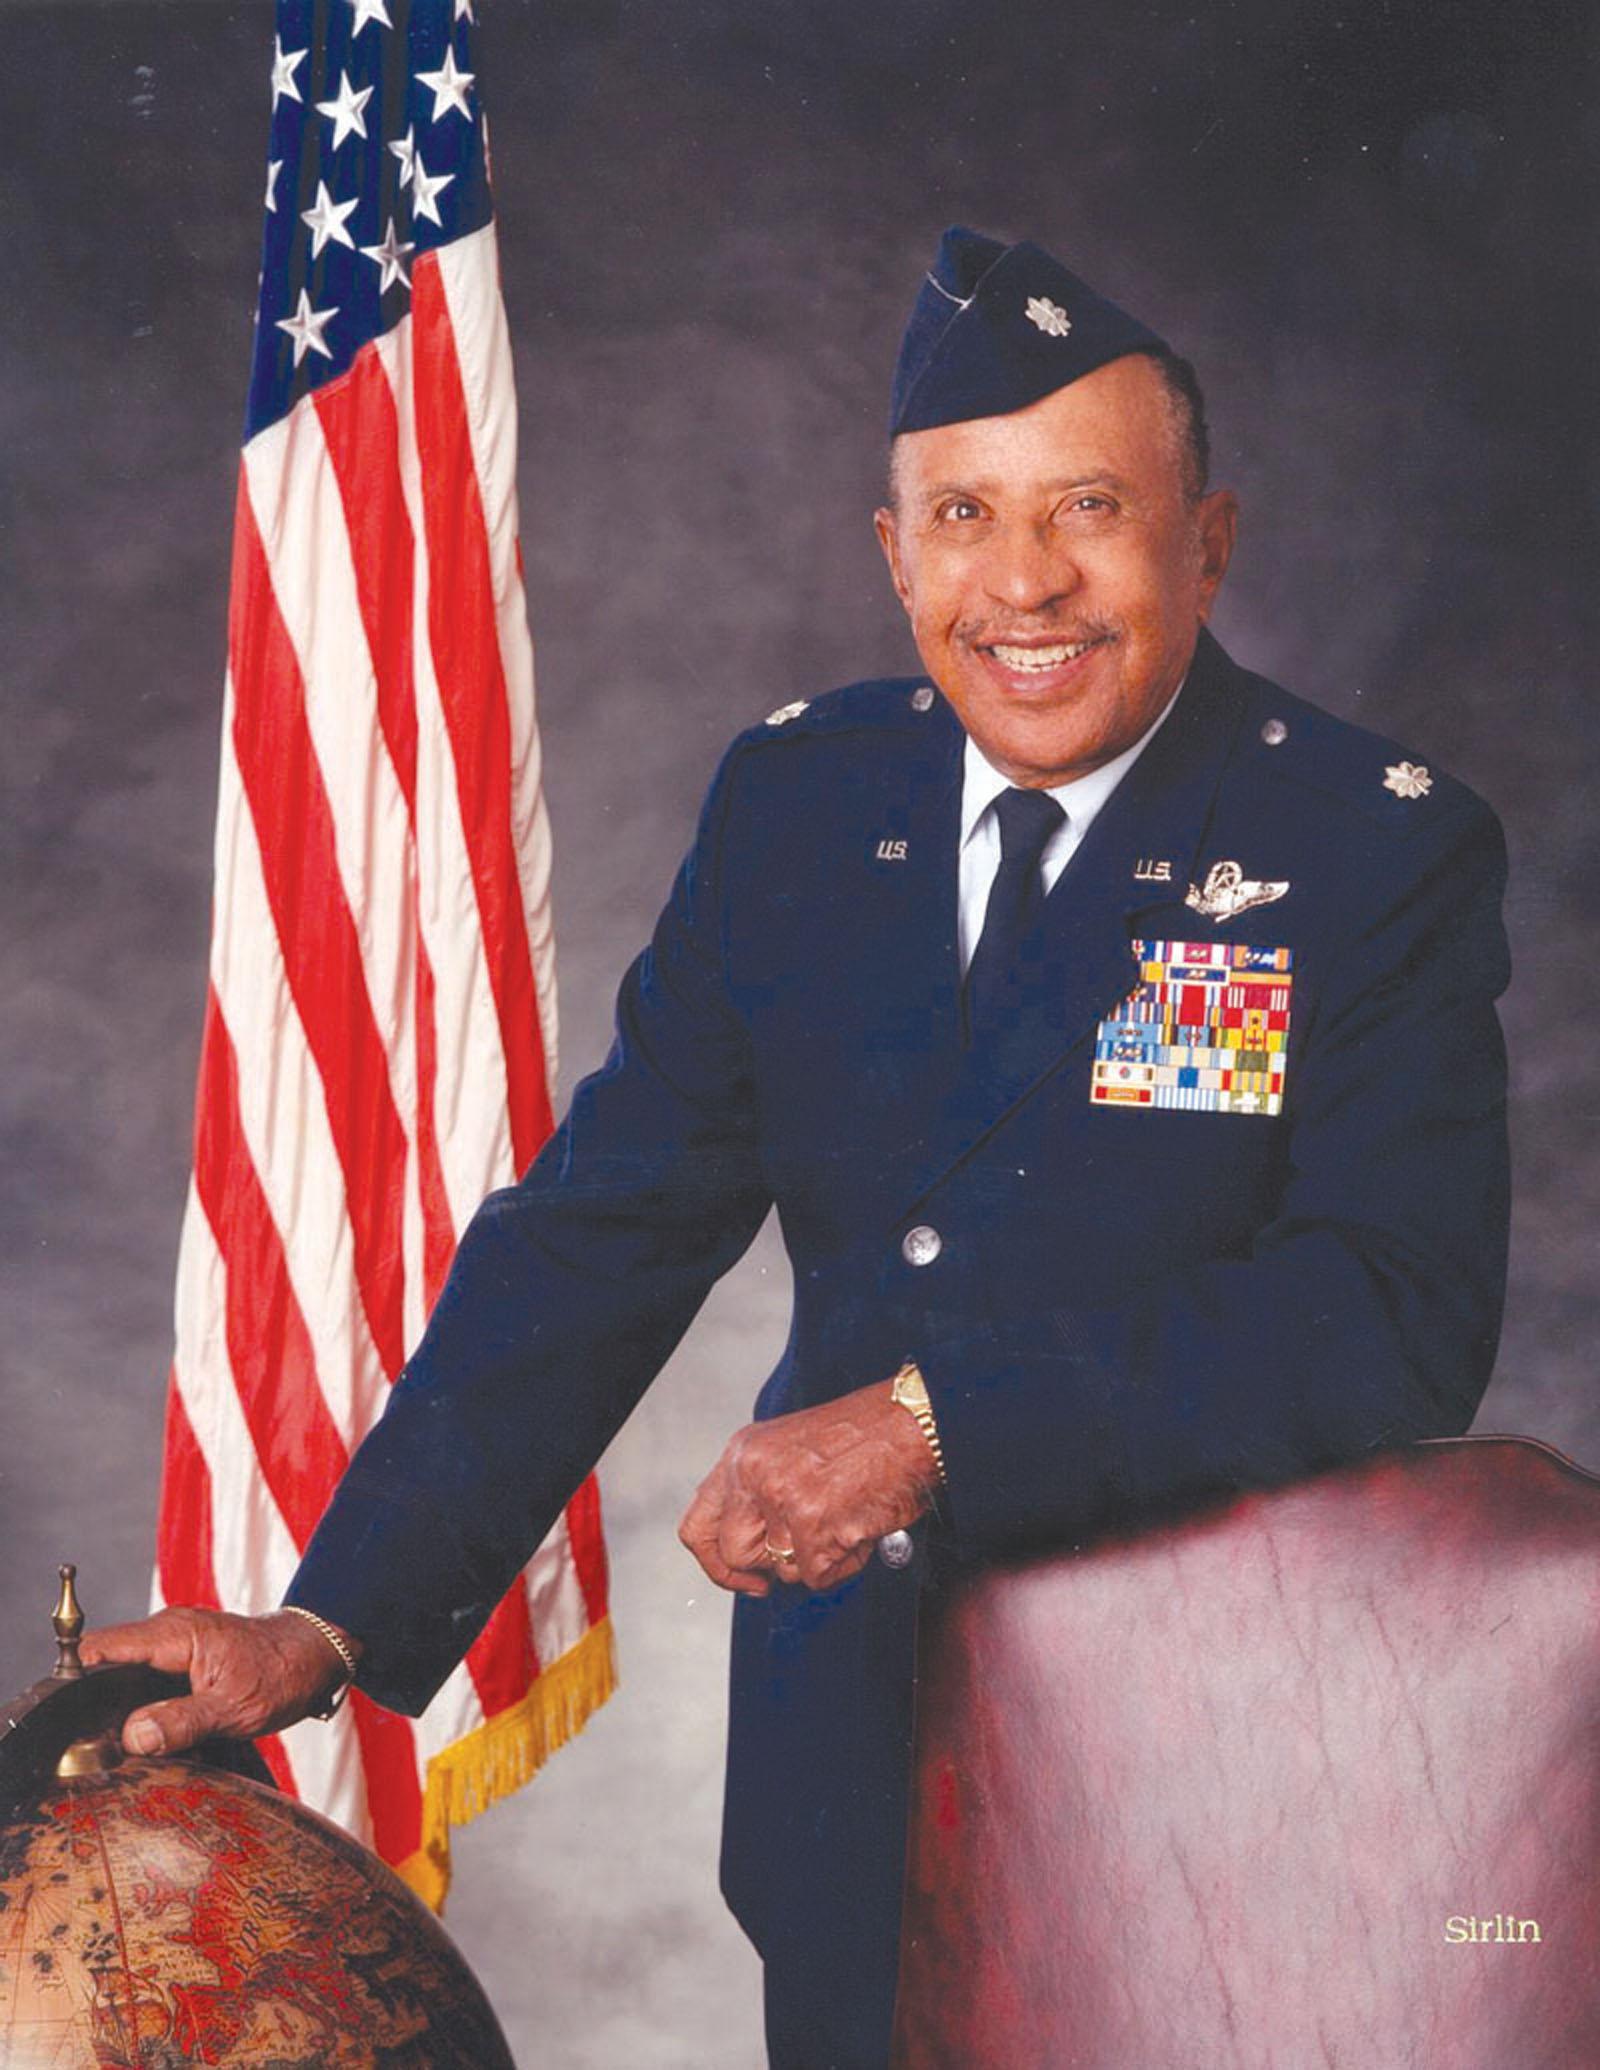 Lt. Col. James C. Warren: Tuskegee Airman, American Hero